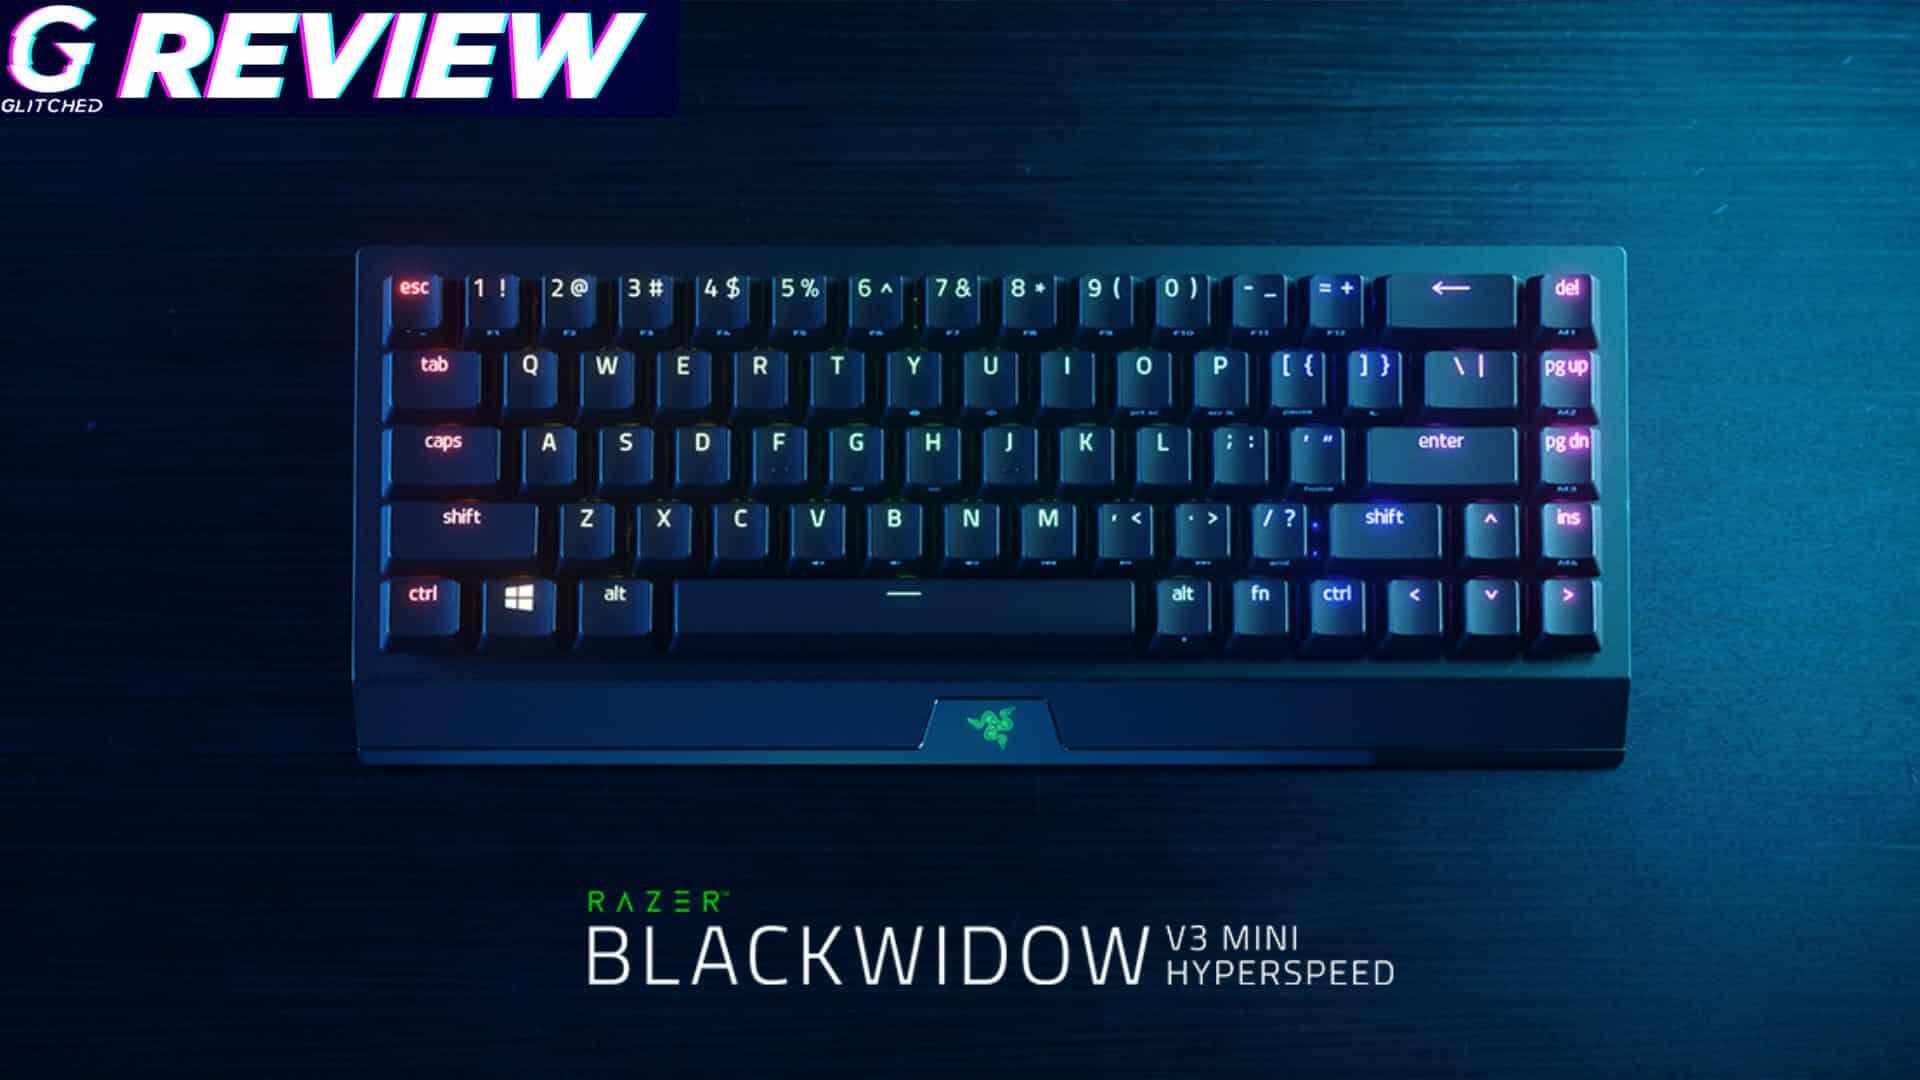 Razer Blackwidow V3 Mini Hyperspeed Gaming Keyboard Review